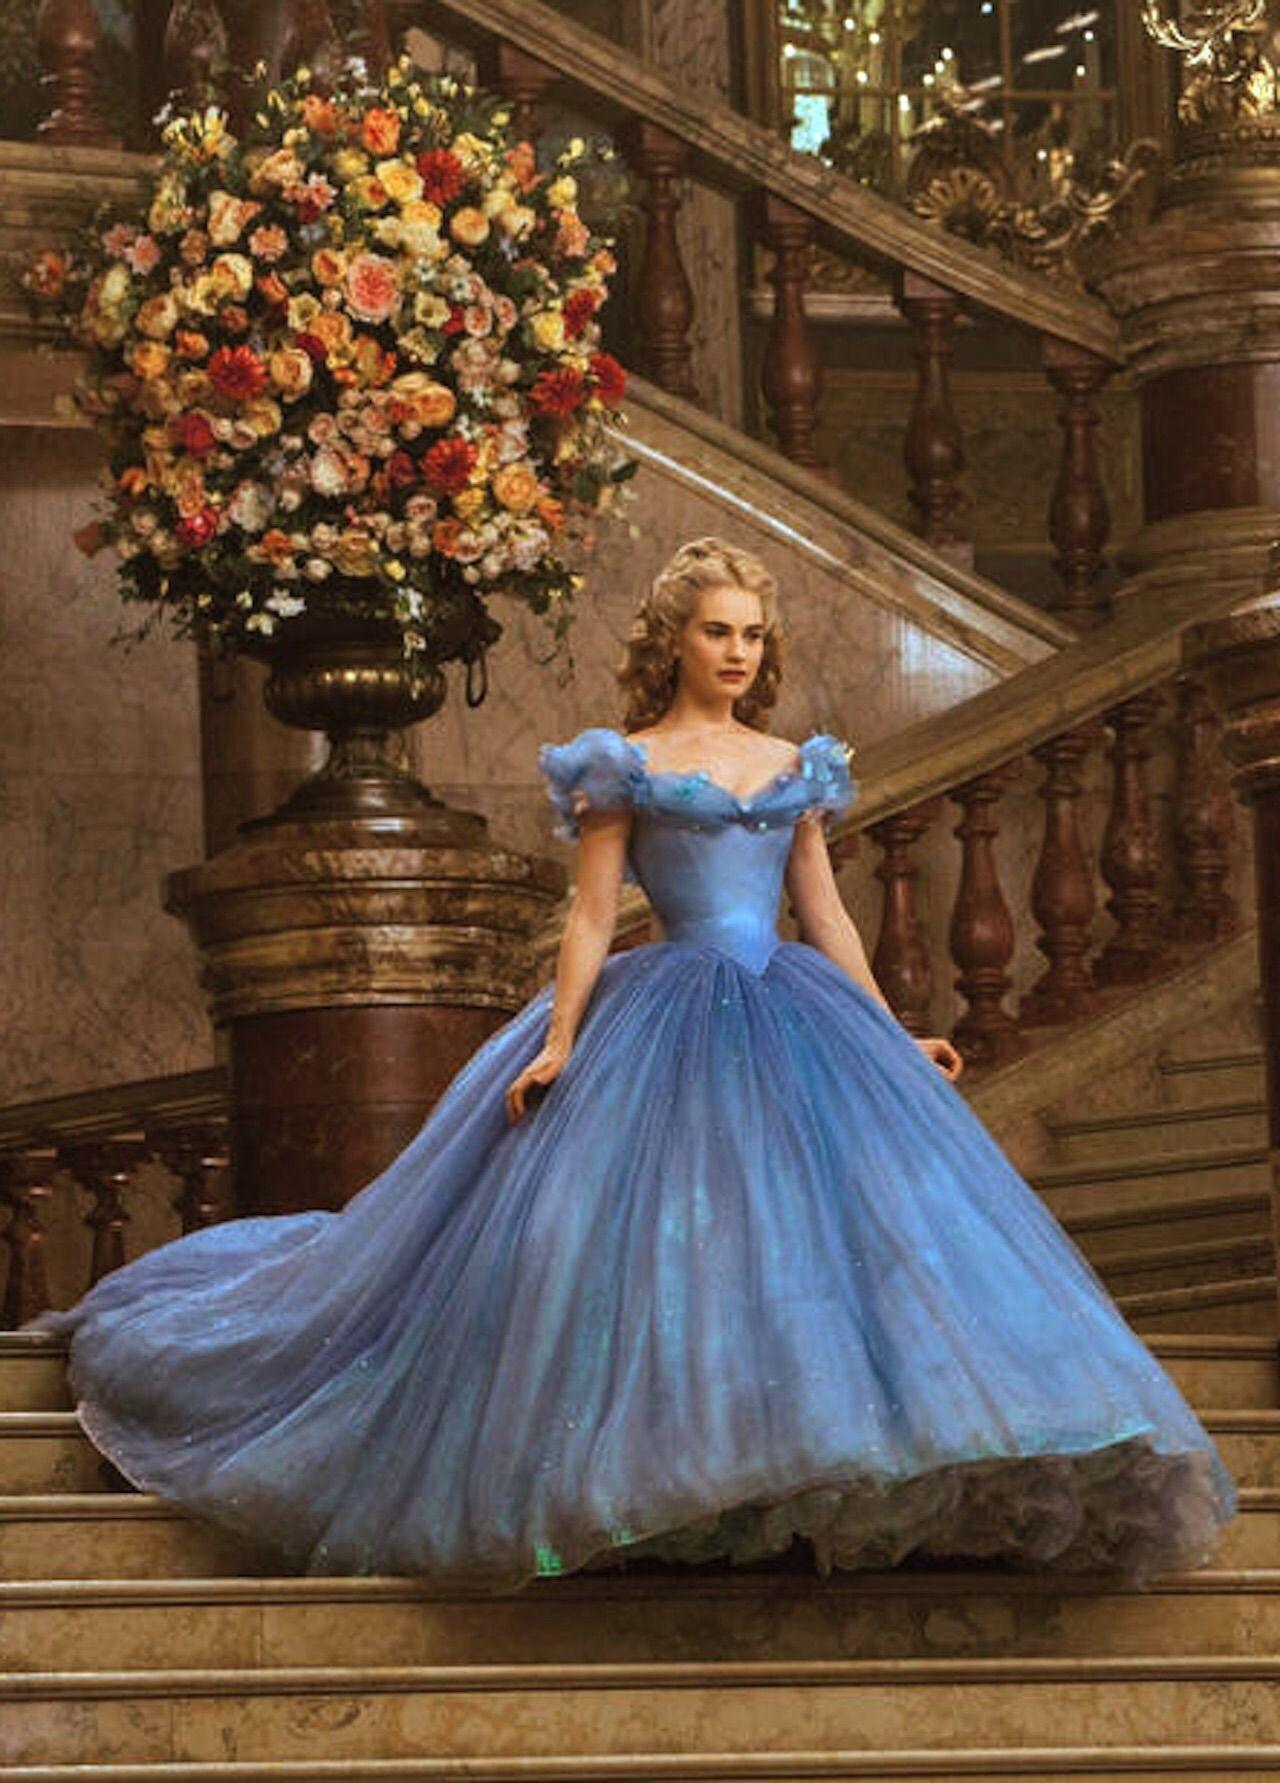 Pretty Hair is Fun: Cinderella at the Ball Hairstyle Tutorial